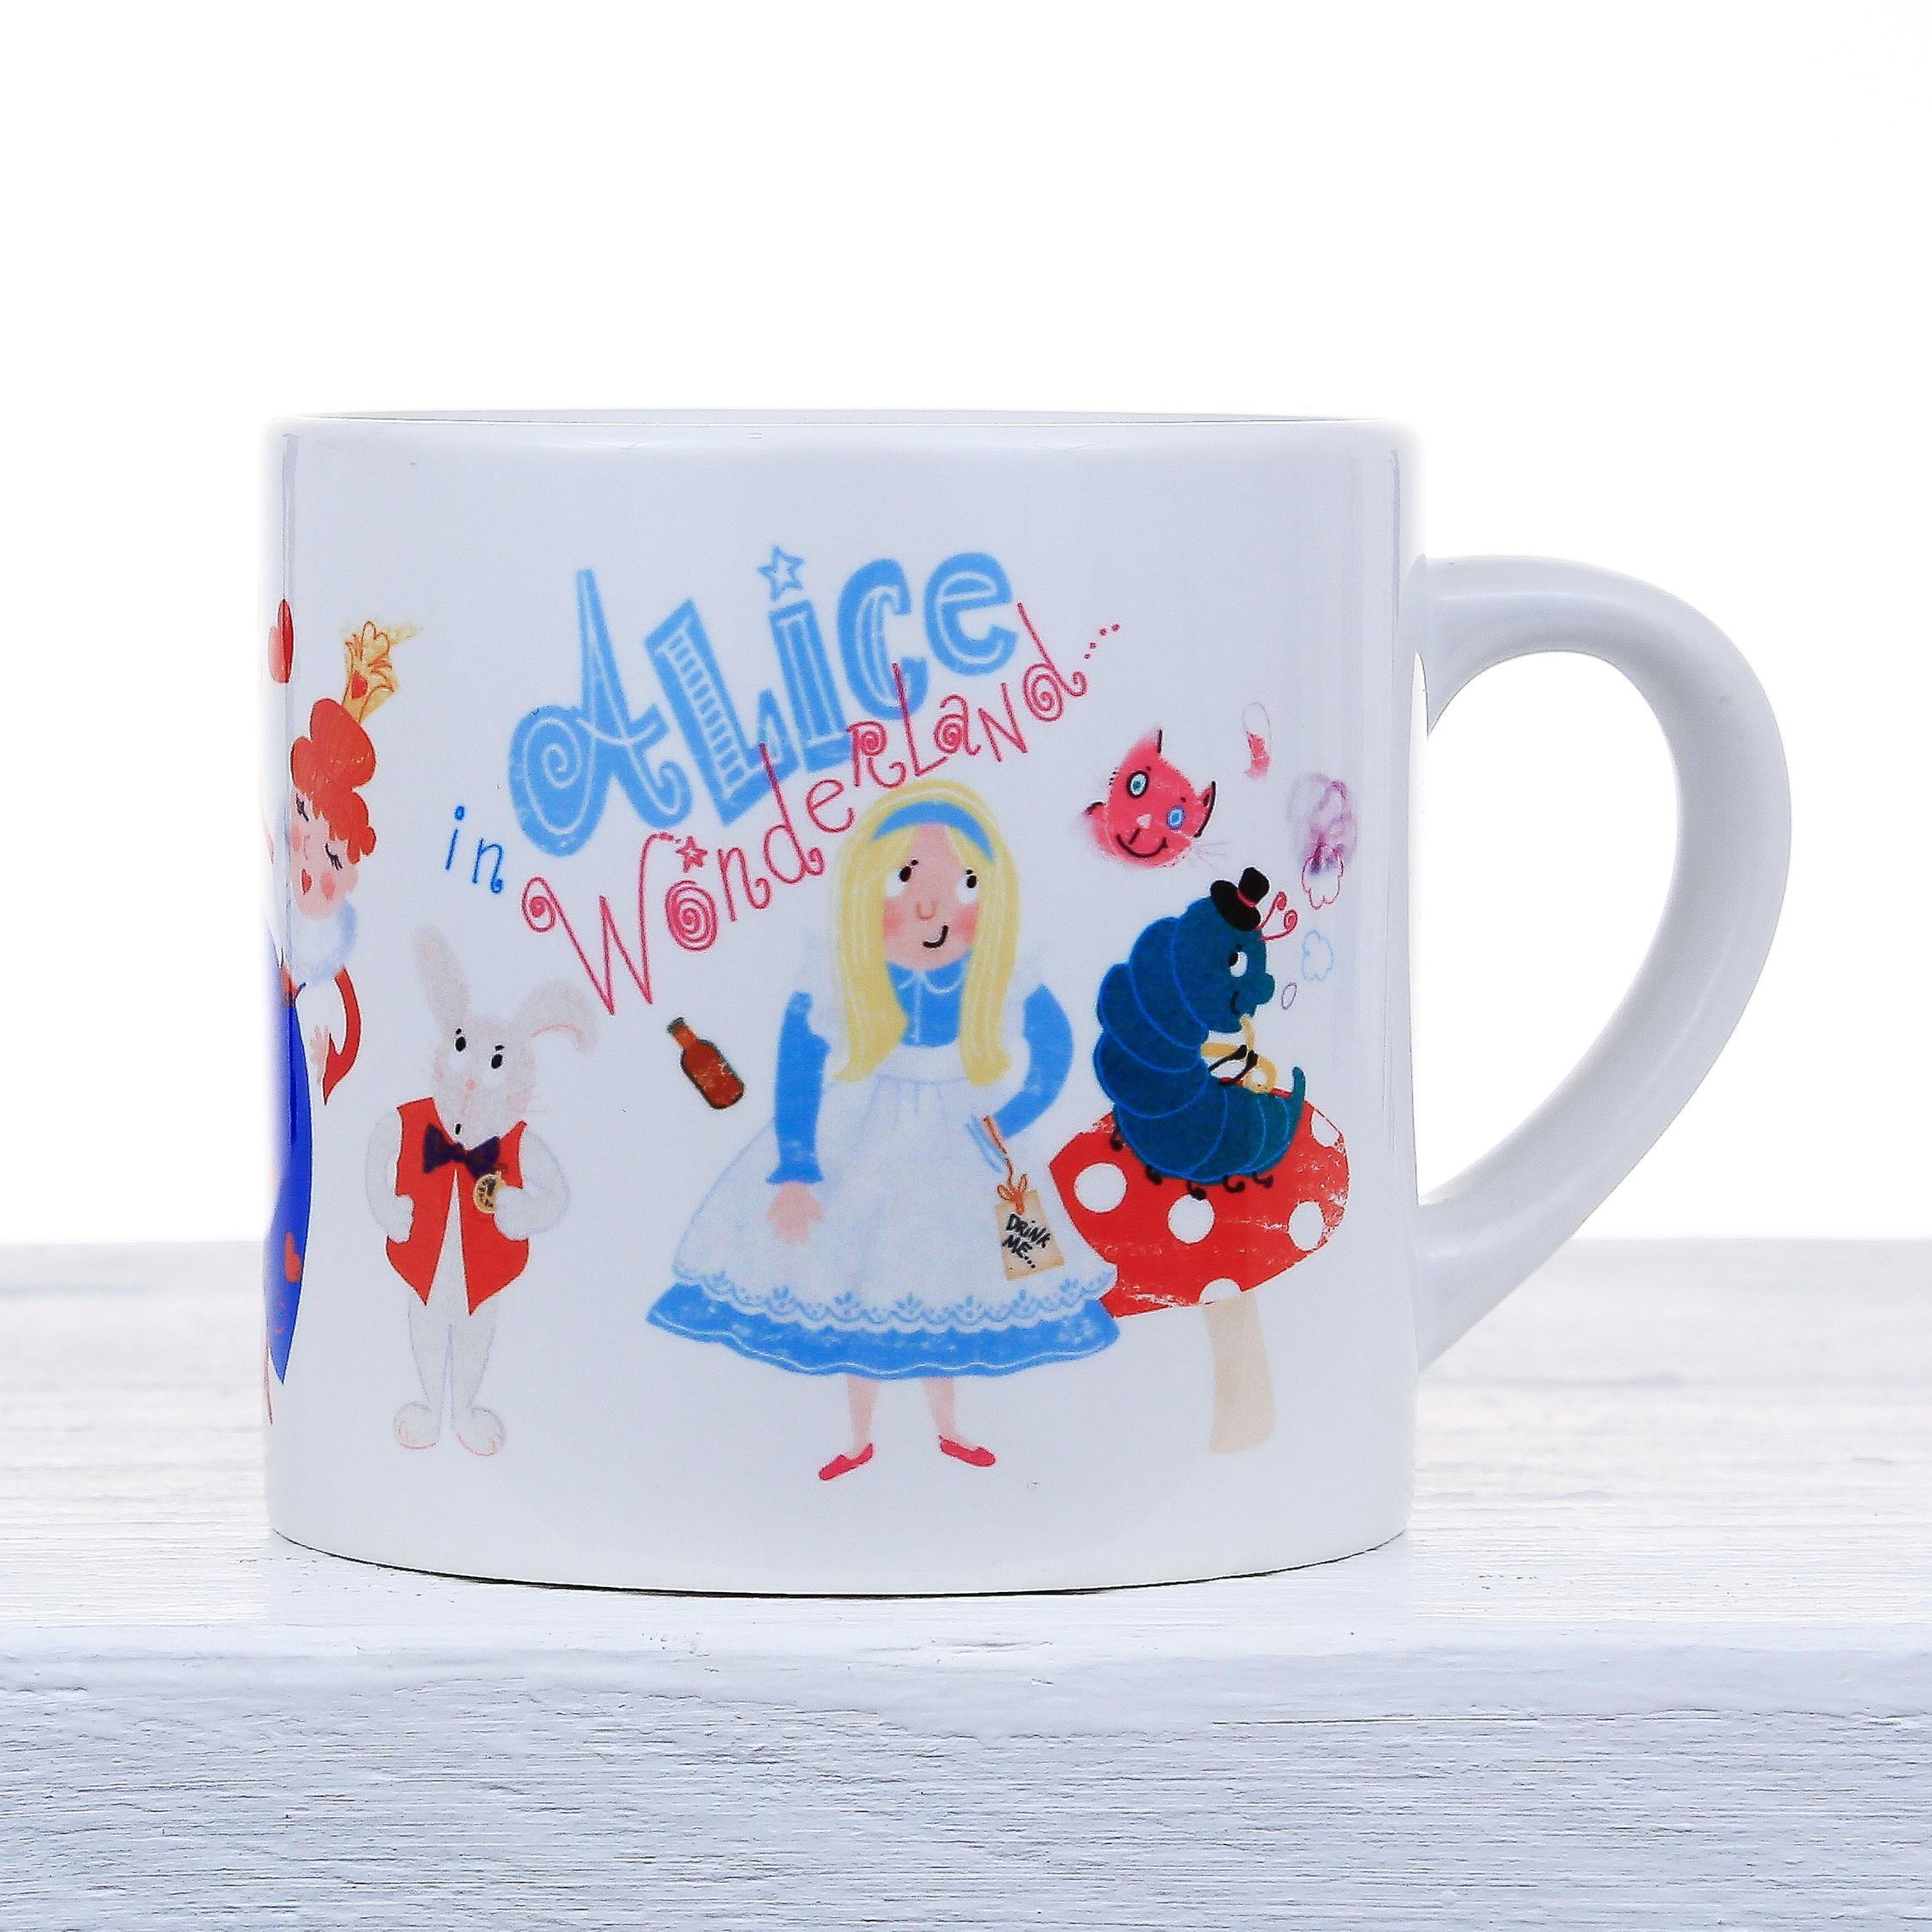 Nursery Rhyme Wonderland Smug Alice In xrChQdtsB